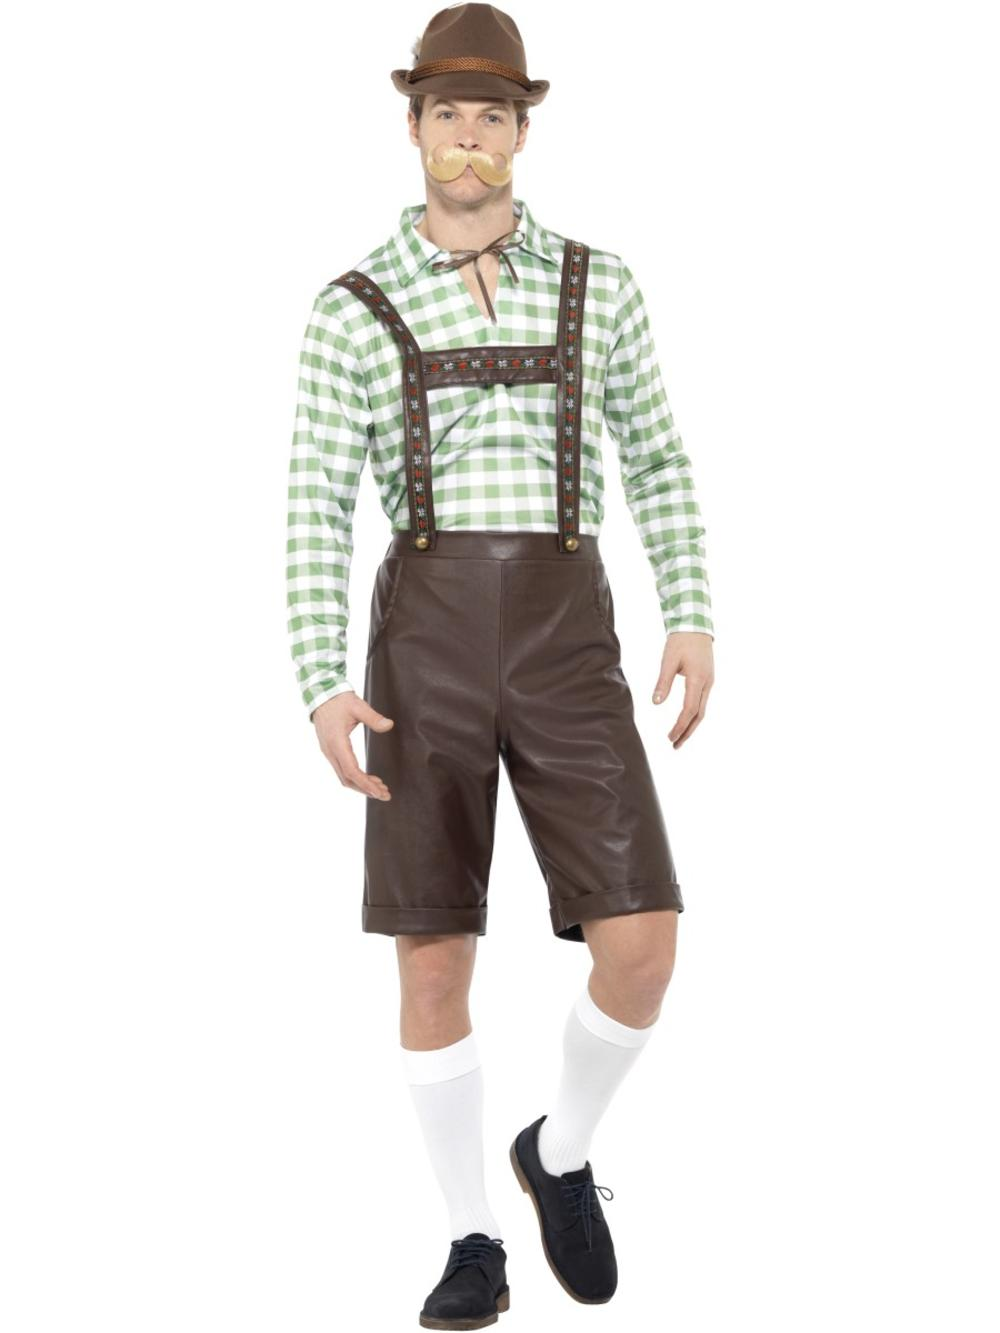 Bavarian Beer Man Mens Fancy Dress Lederhosen German Oktoberfest Adults Costume